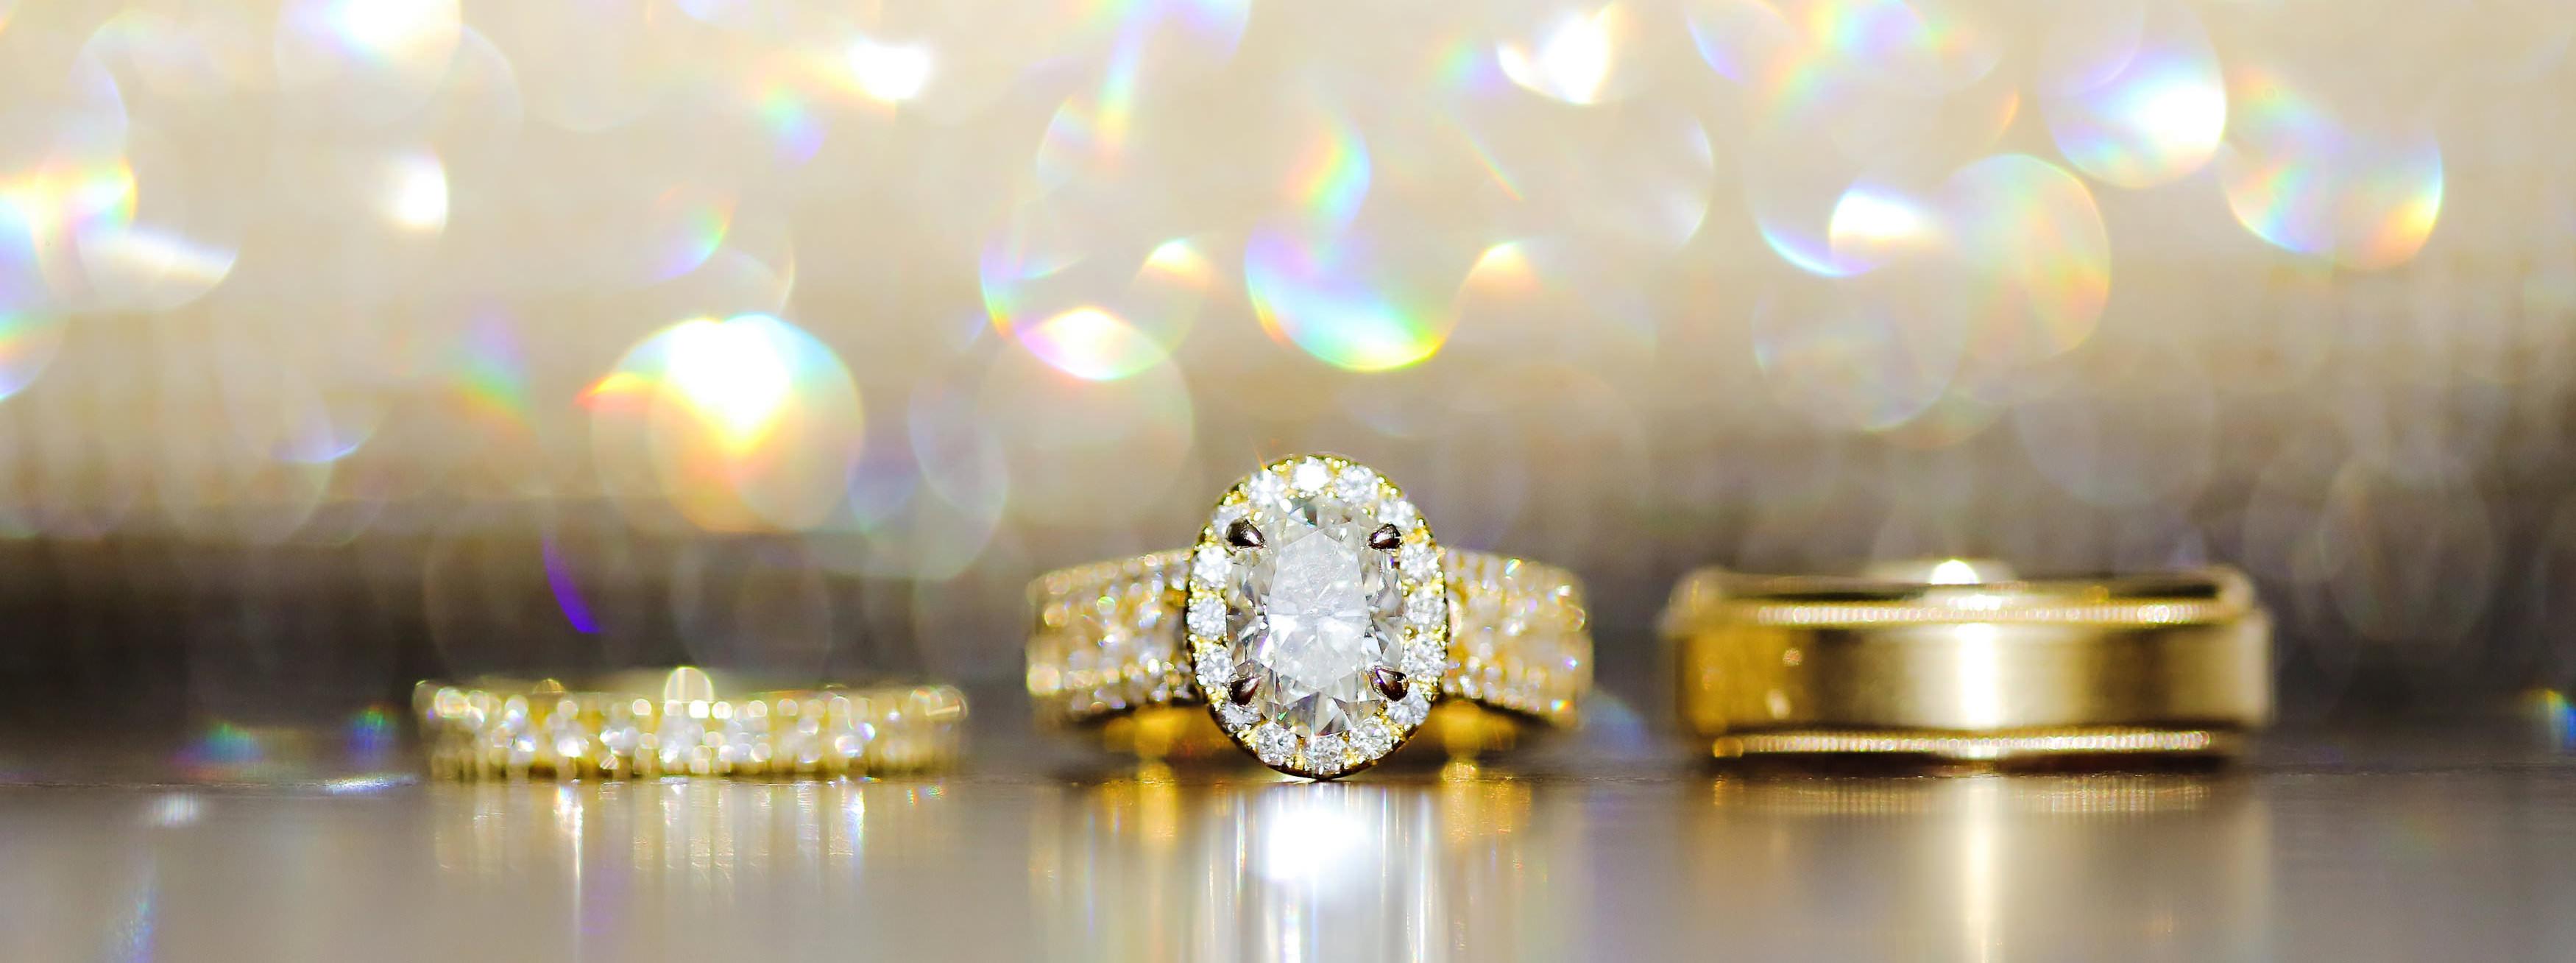 Photography: Jessica Strickland Photography | Jessica Dum Wedding Coordination